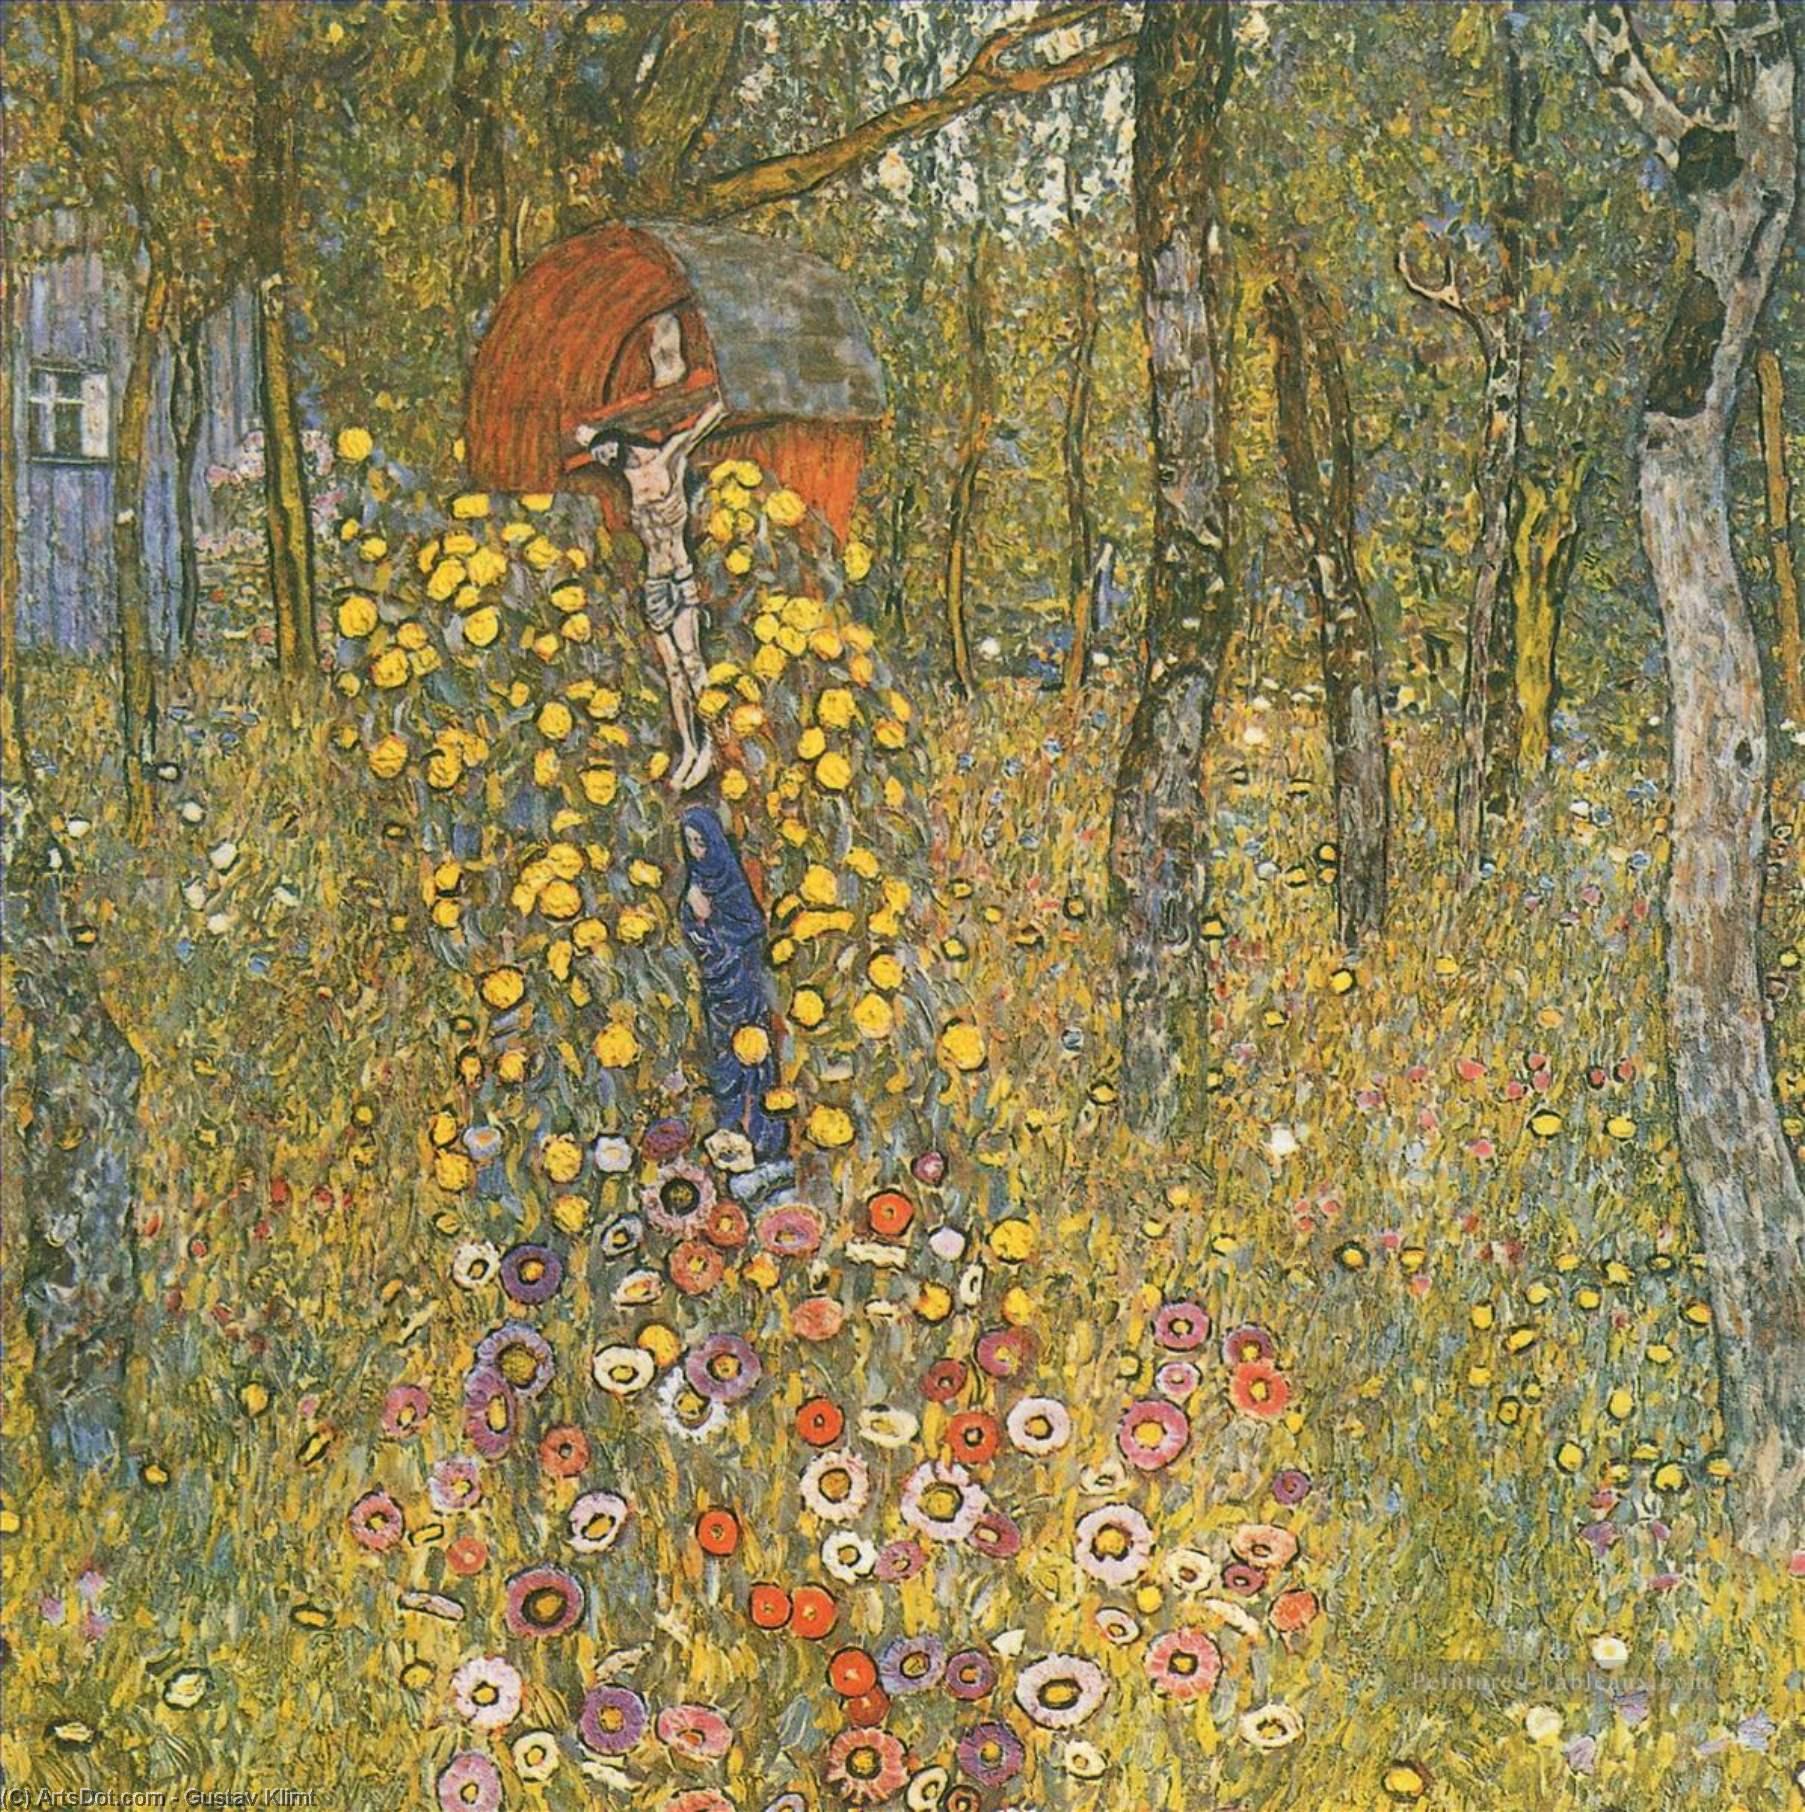 Wikoo.org - موسوعة الفنون الجميلة - اللوحة، العمل الفني Gustav Klimt - Farm Garden with Crucifix